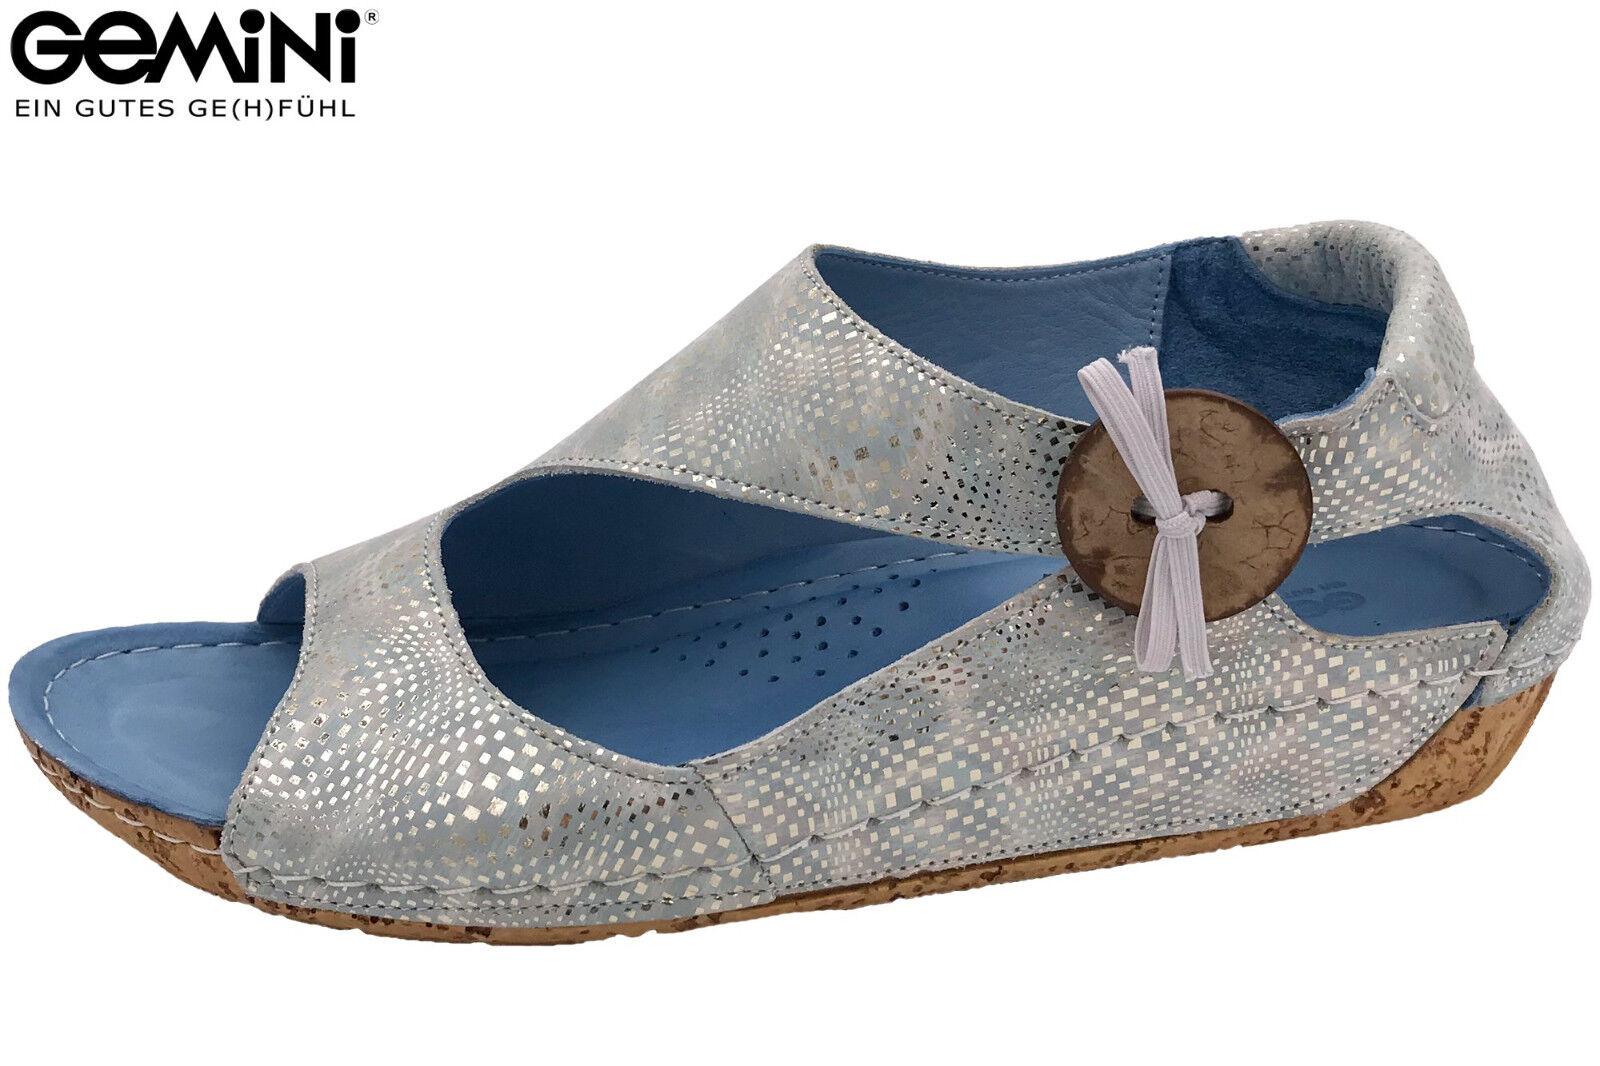 Gemini Damen Sandalee Blau Grau Metallic Leder Sommer Schuhe 32029-800 NEU